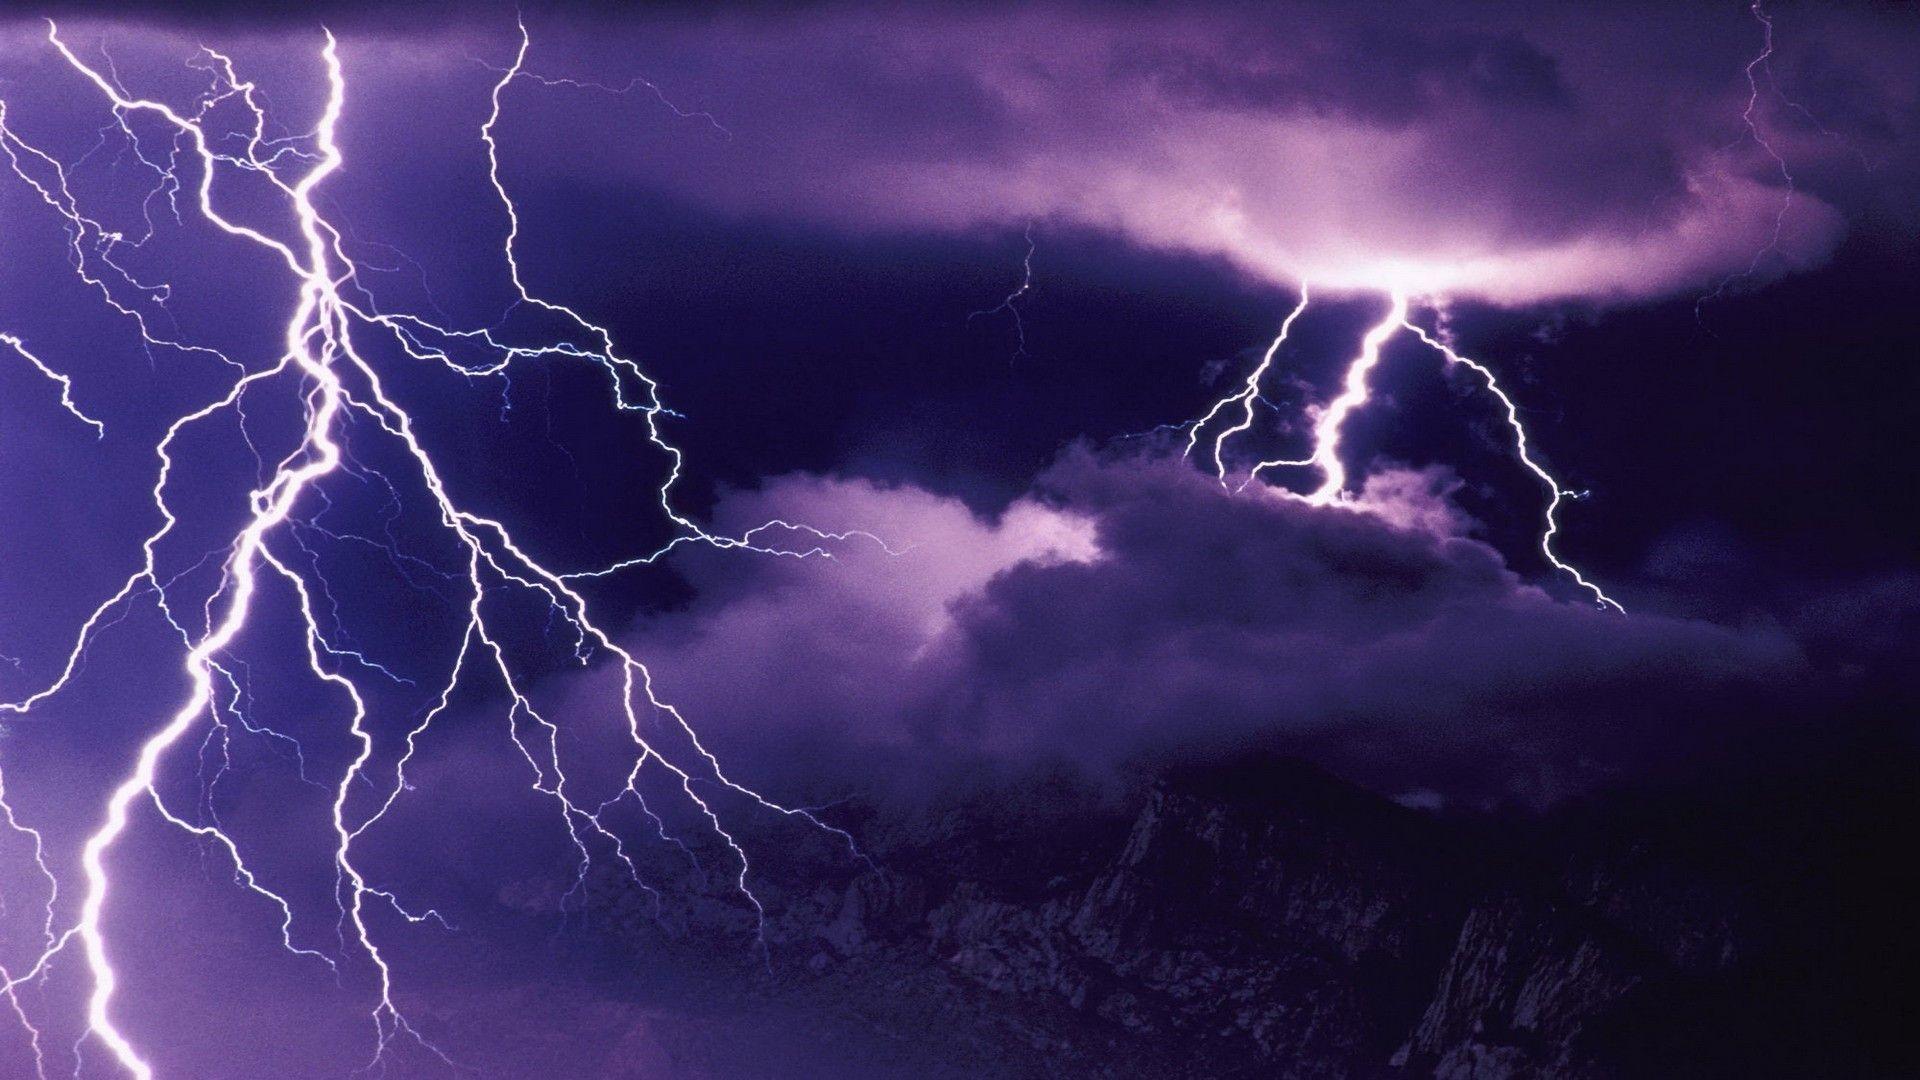 Lightning Storm Wallpaper HD Free.